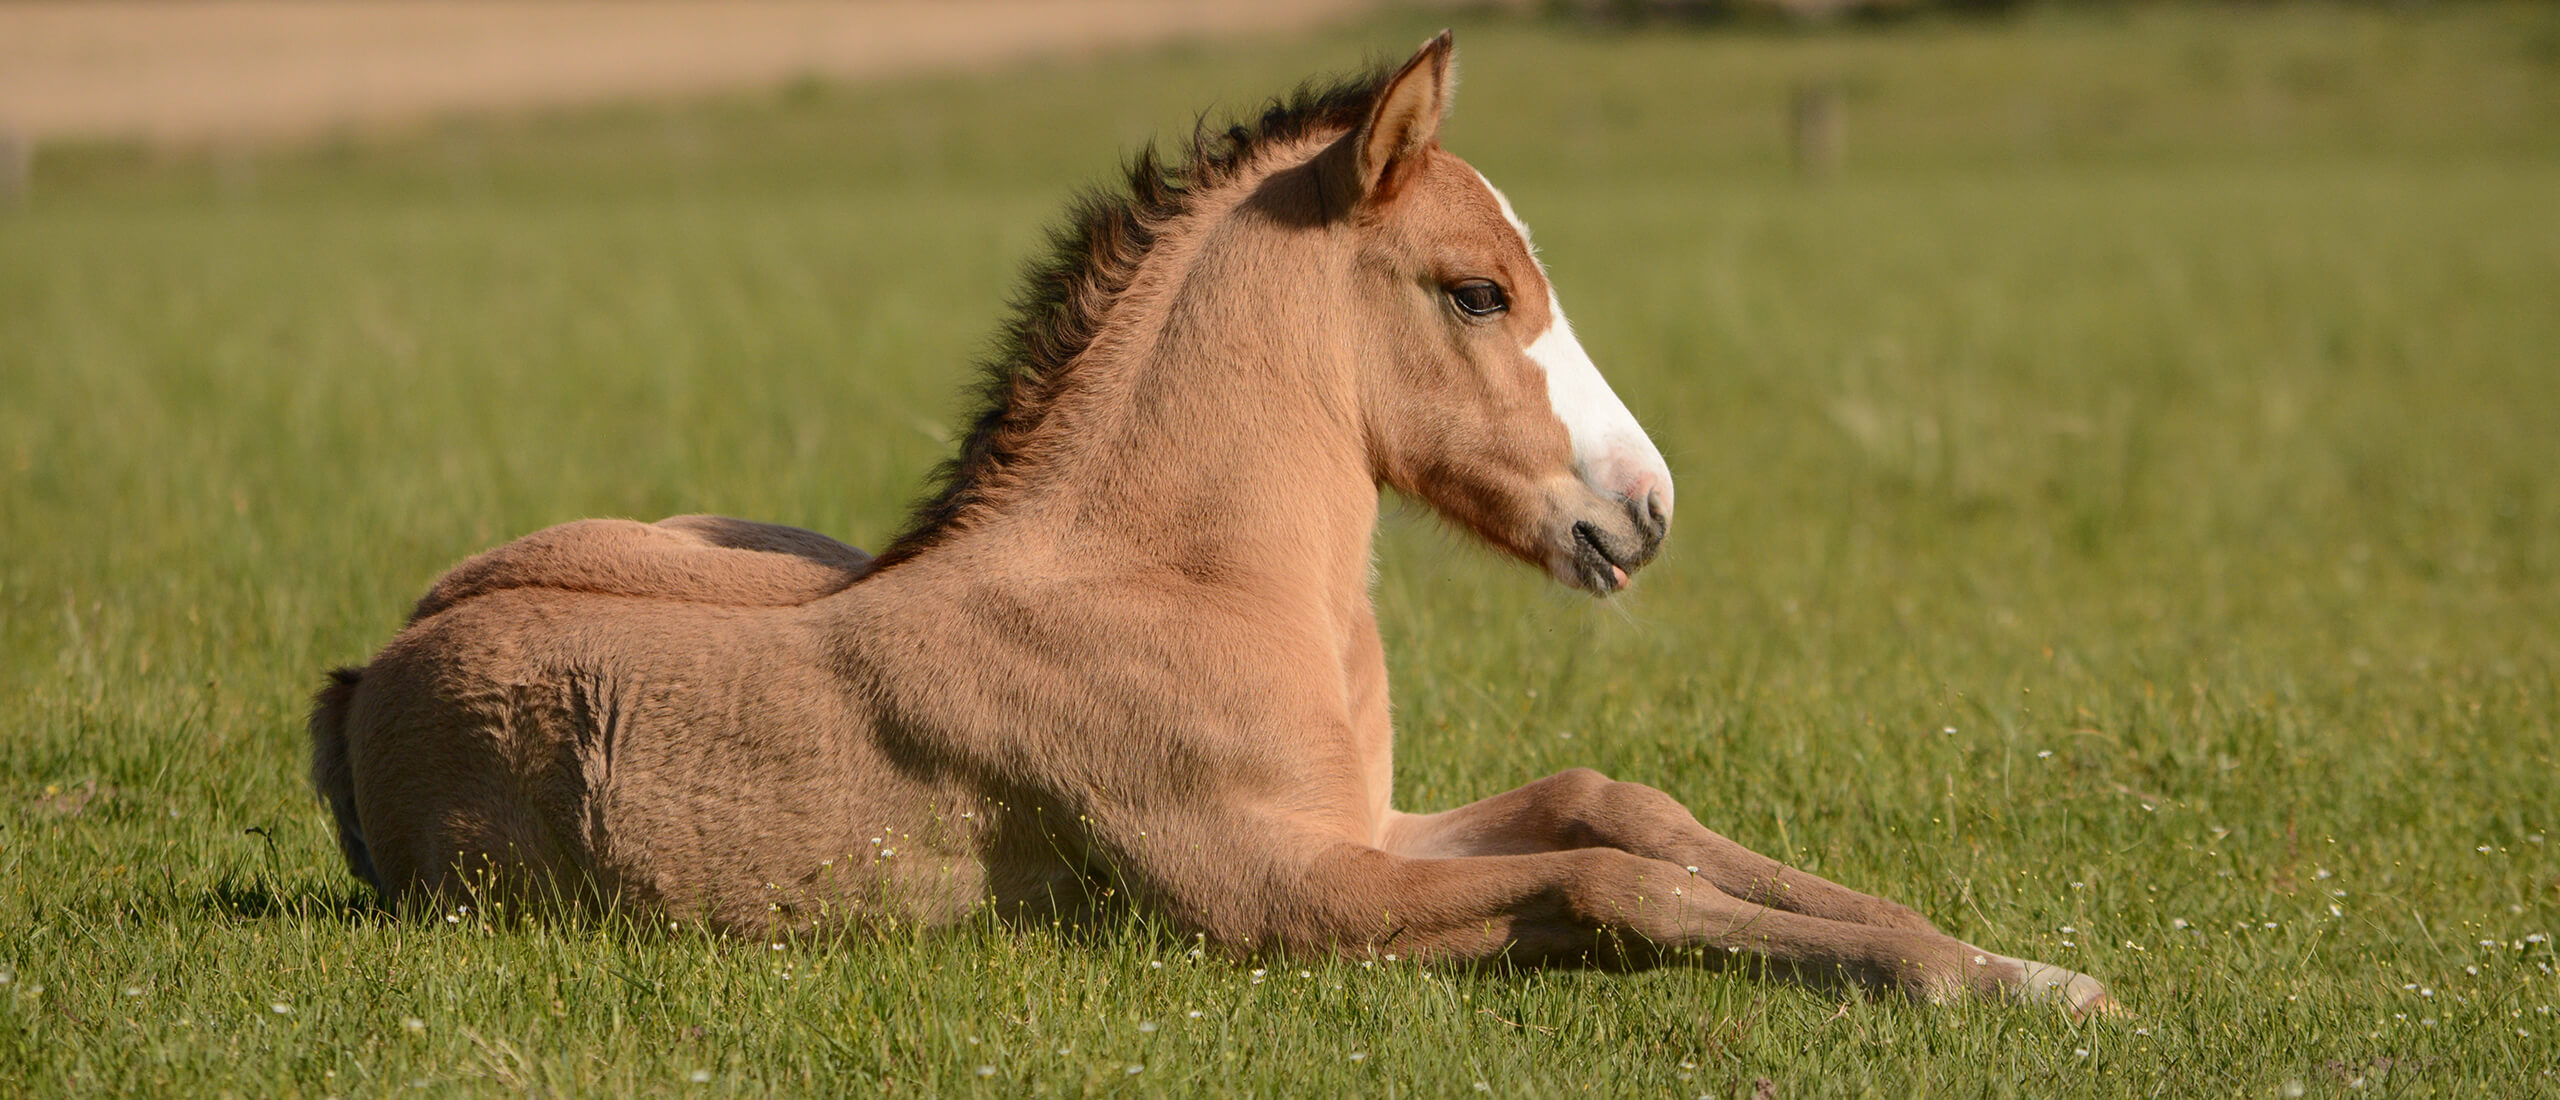 brown foal lying on grass